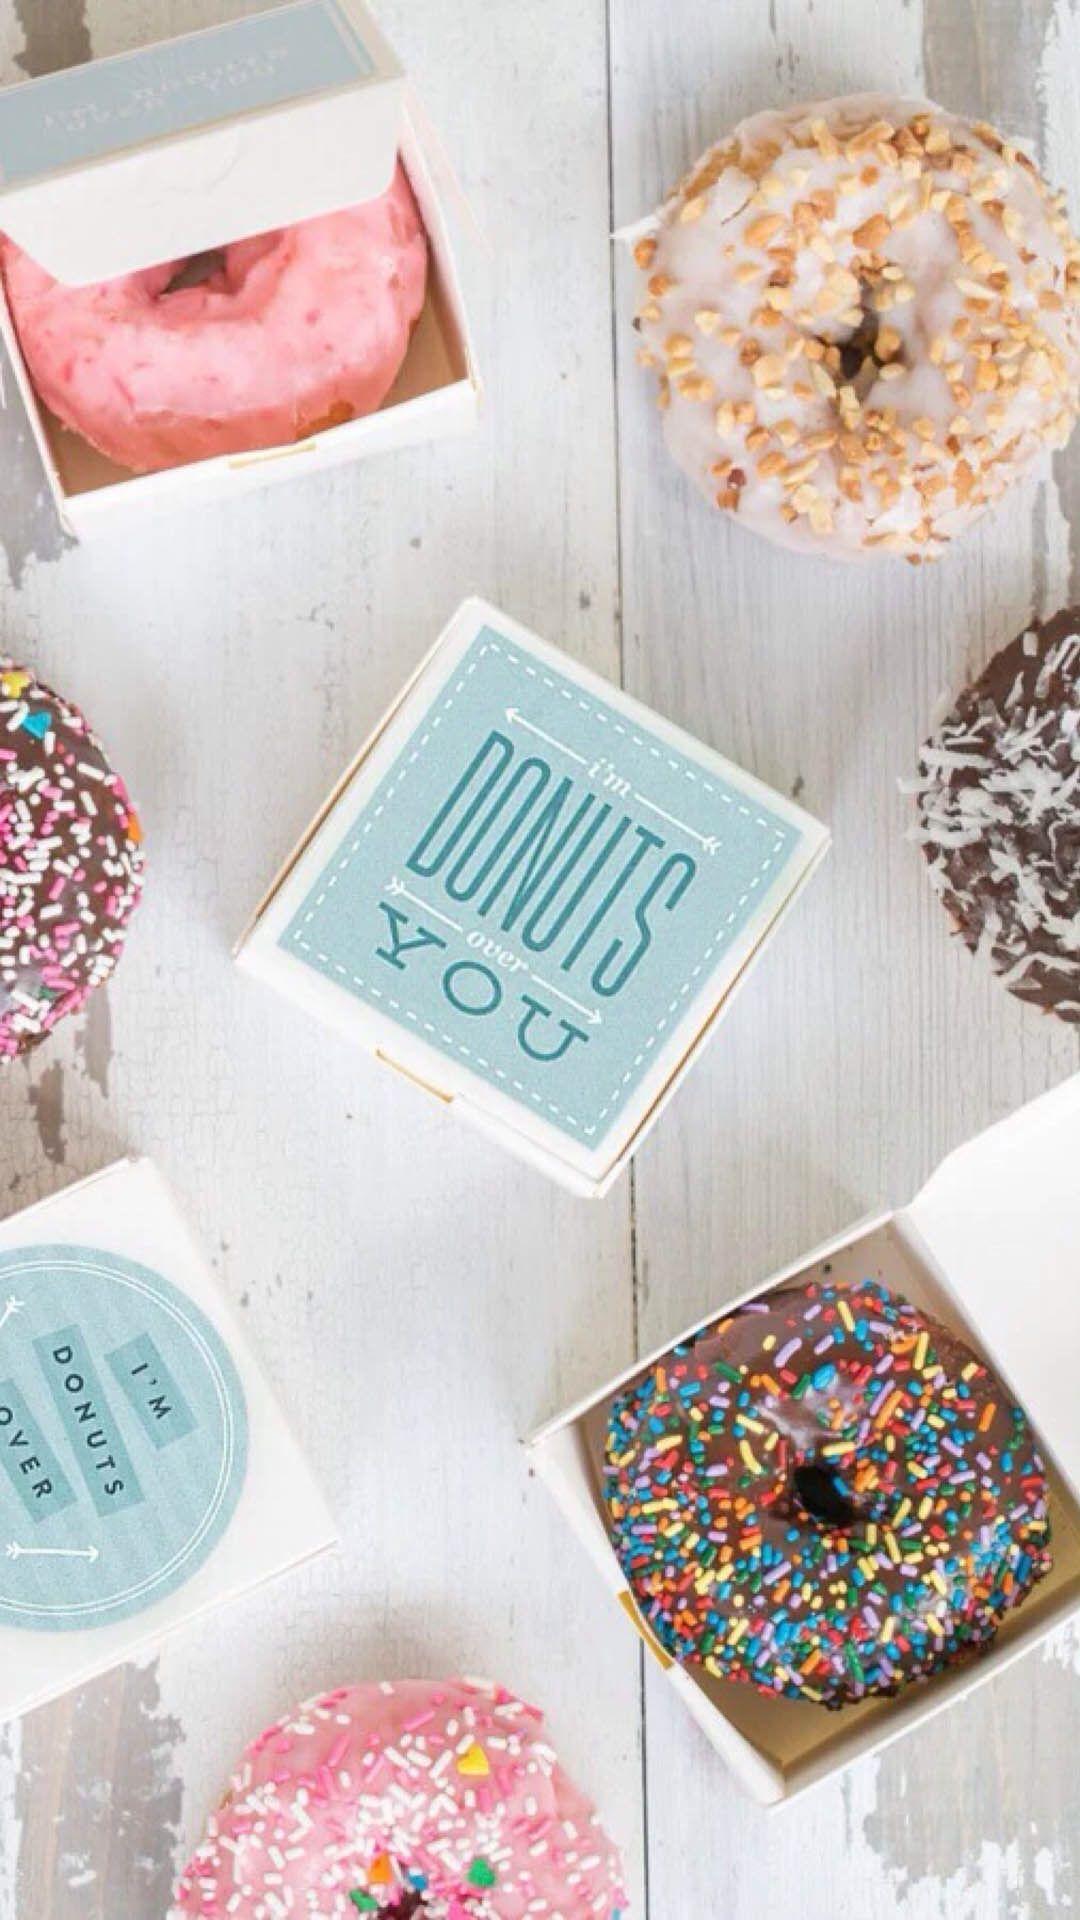 Pin by Mrs Konopatskaya on Sweet | Pinterest | Donuts, Doughnuts and ...